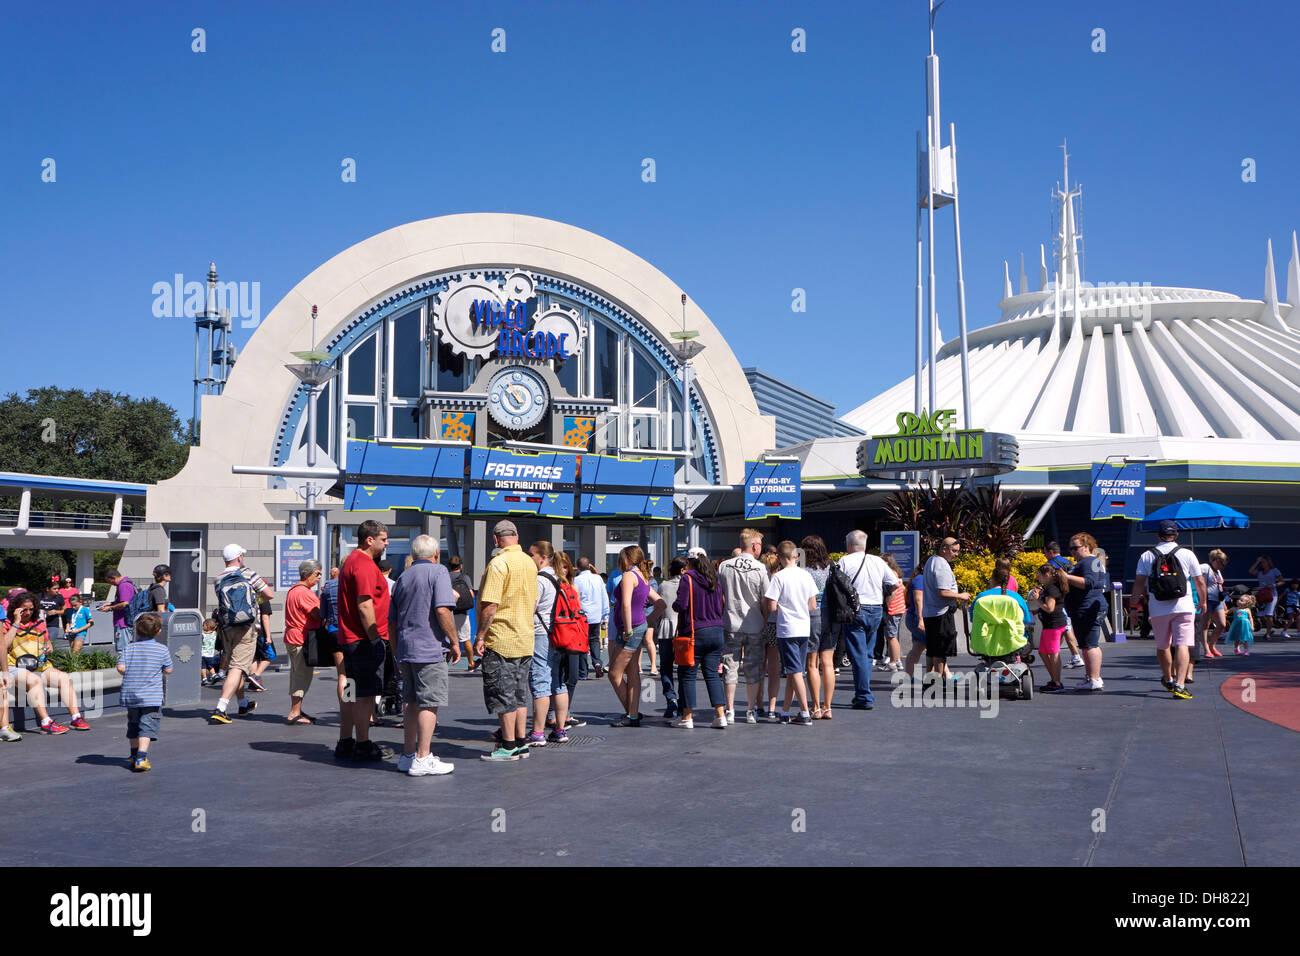 Video Arcade and Space Mountain at Tomorrowland, Disney World Resort, Orlando Florida - Stock Image